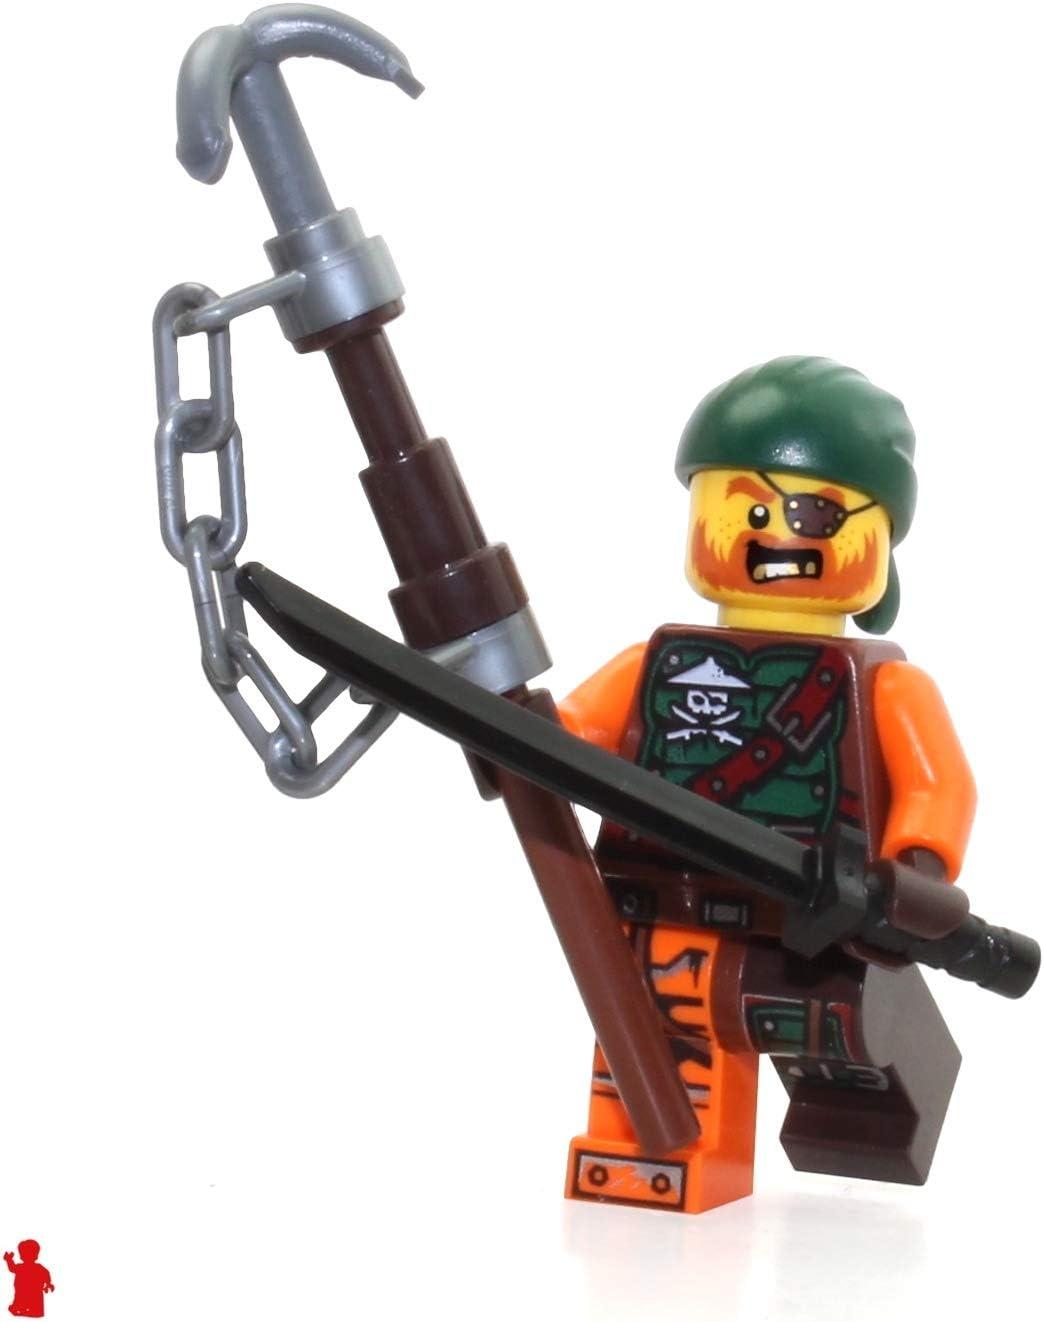 Lego 5 New Dark Brown Minifigure Scabbard for Two Katanas Pieces